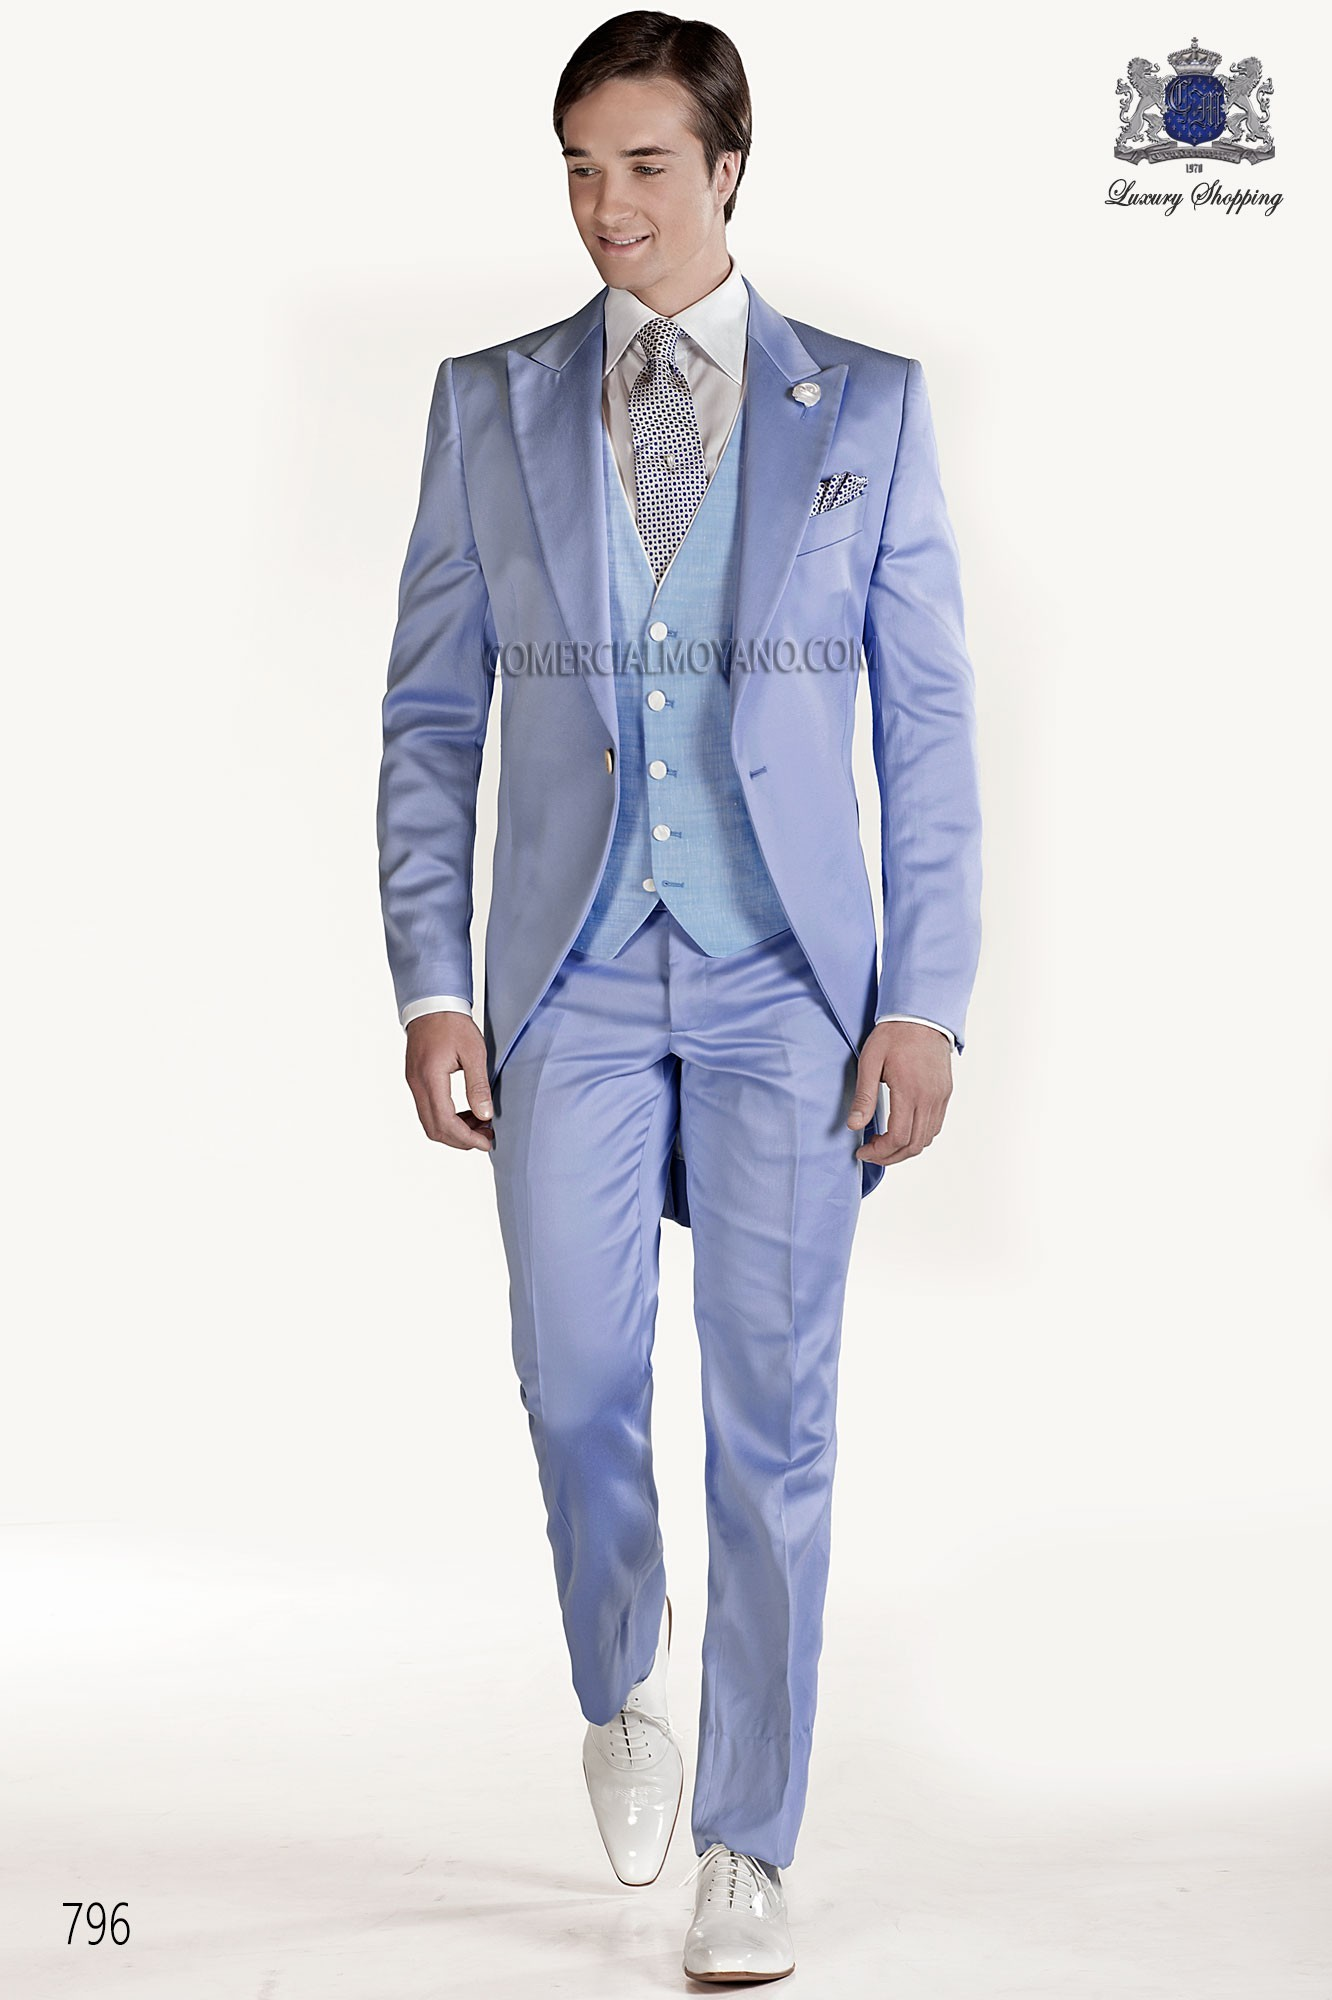 Hipster blue men wedding suit model 796 Ottavio Nuccio Gala